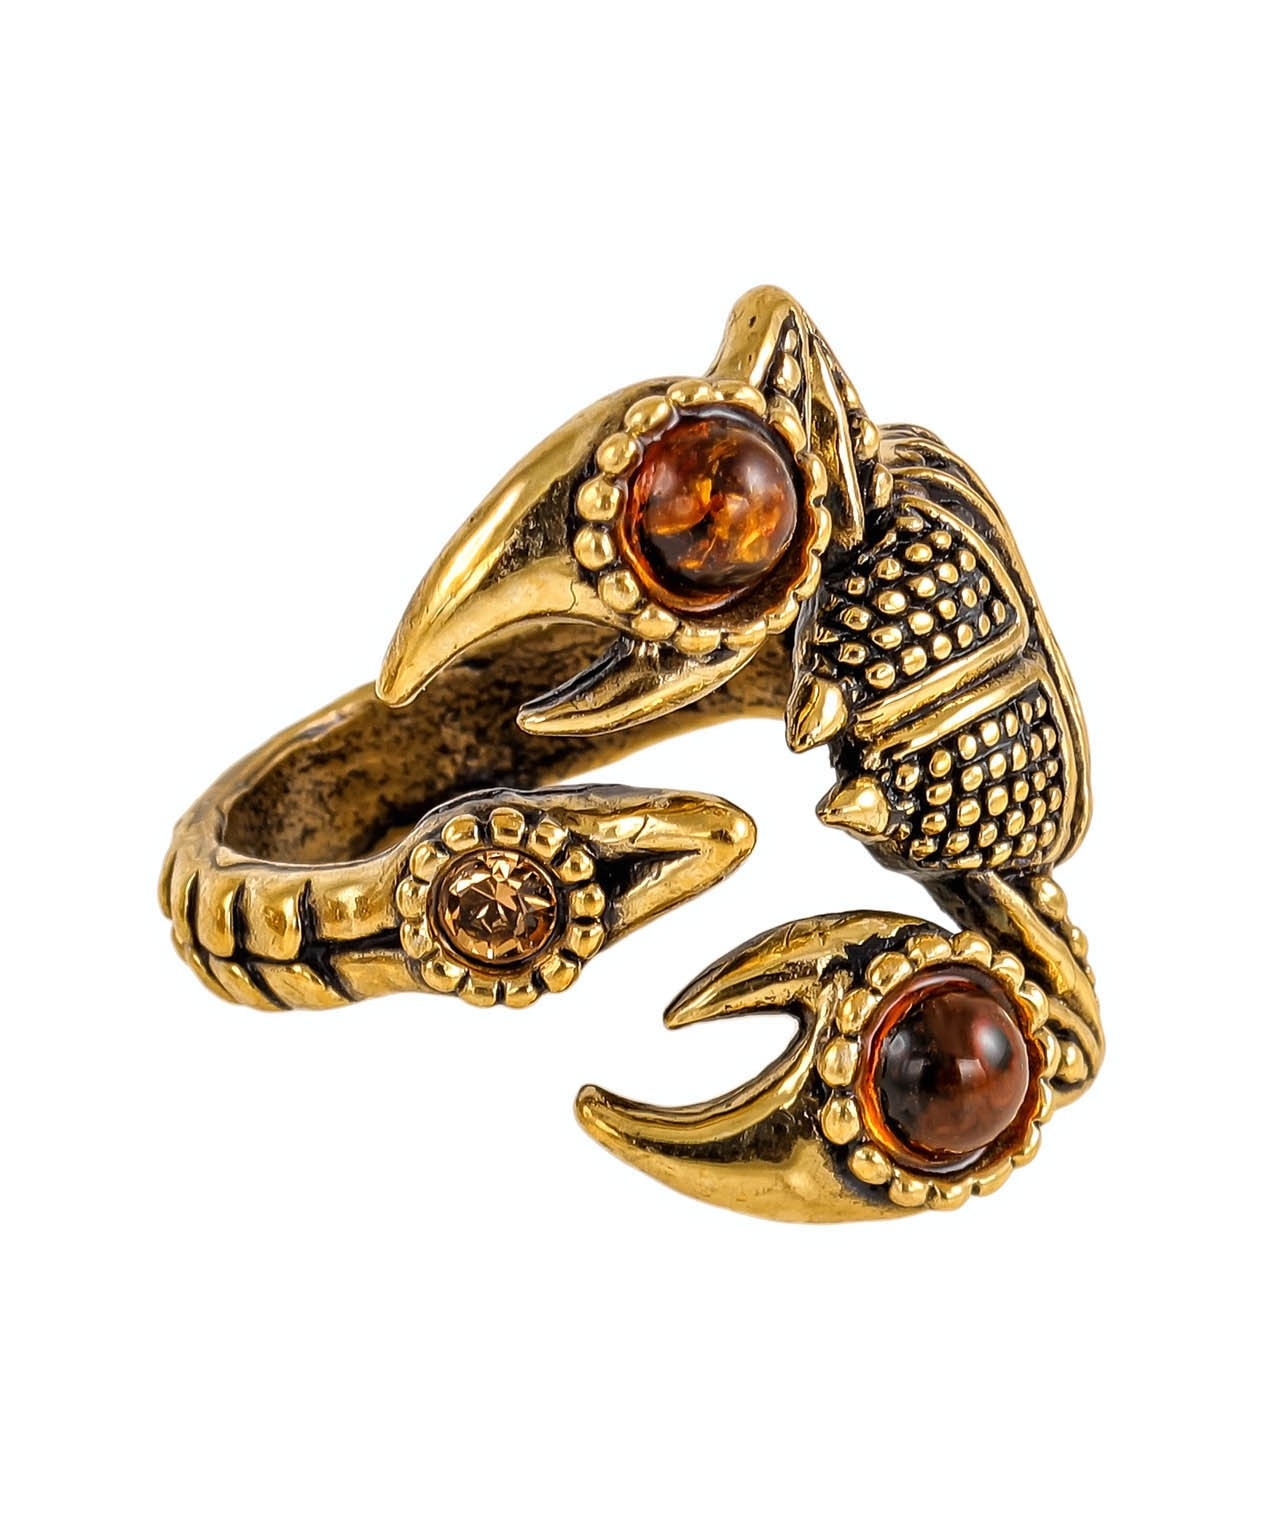 Кольцо Скорпион со стразом 2363К